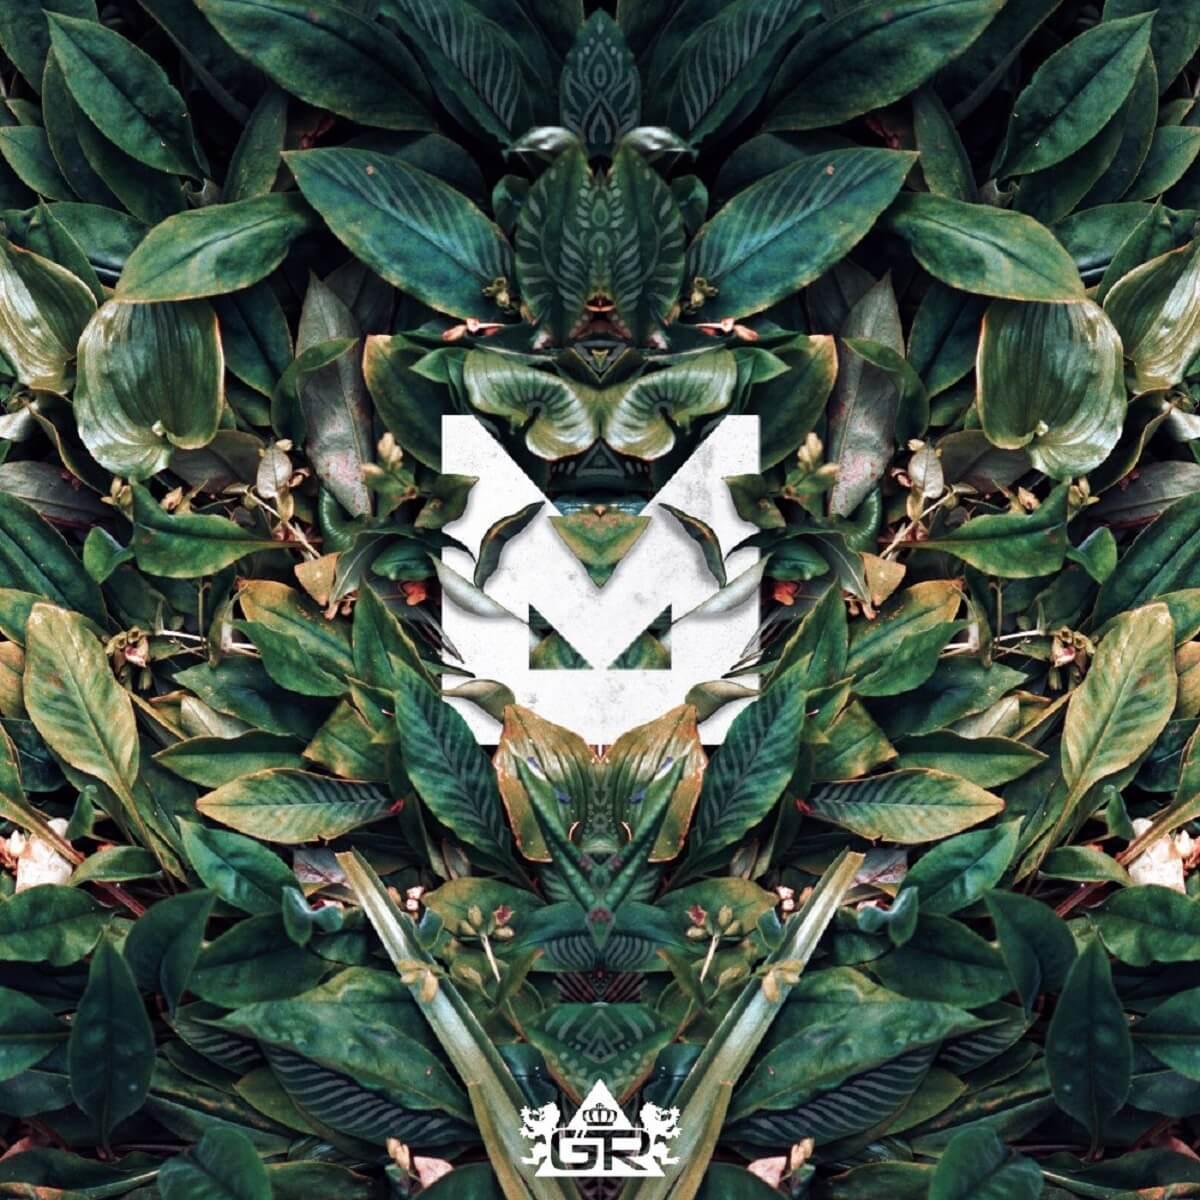 MORiLLO Shades of Green Electric Hawk